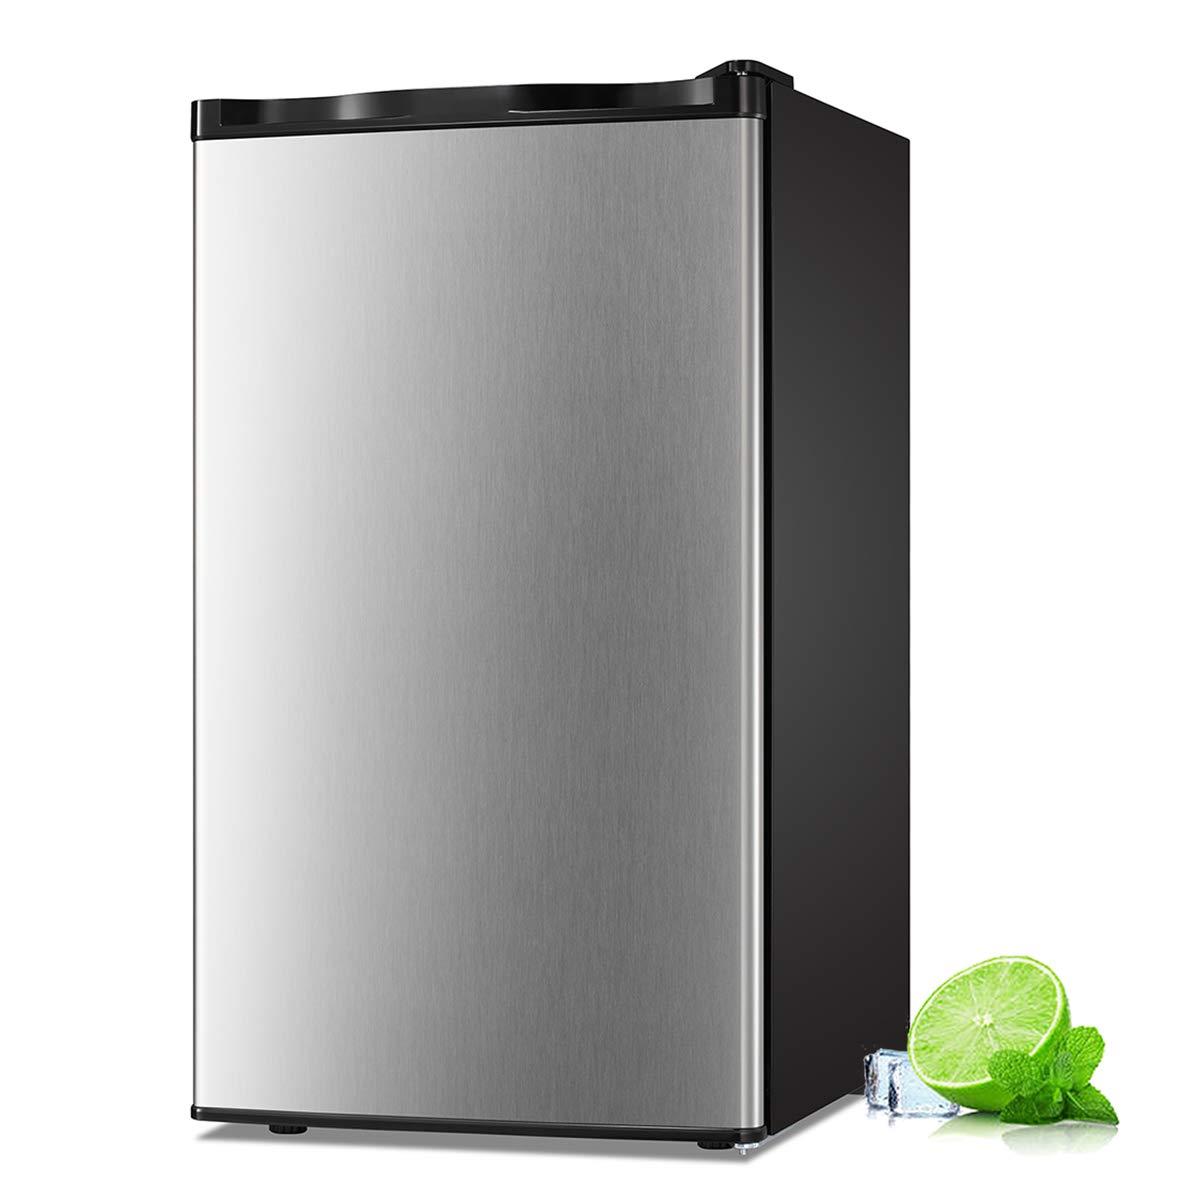 Antarctic Star Compact Mini Refrigerator Separate Freezer, Small Fridge Double Single-Door Adjustable Removable Retro Stainless Steel Shelves Garage Camper Basement/Dorm/Office 3.2 cu ft Gray